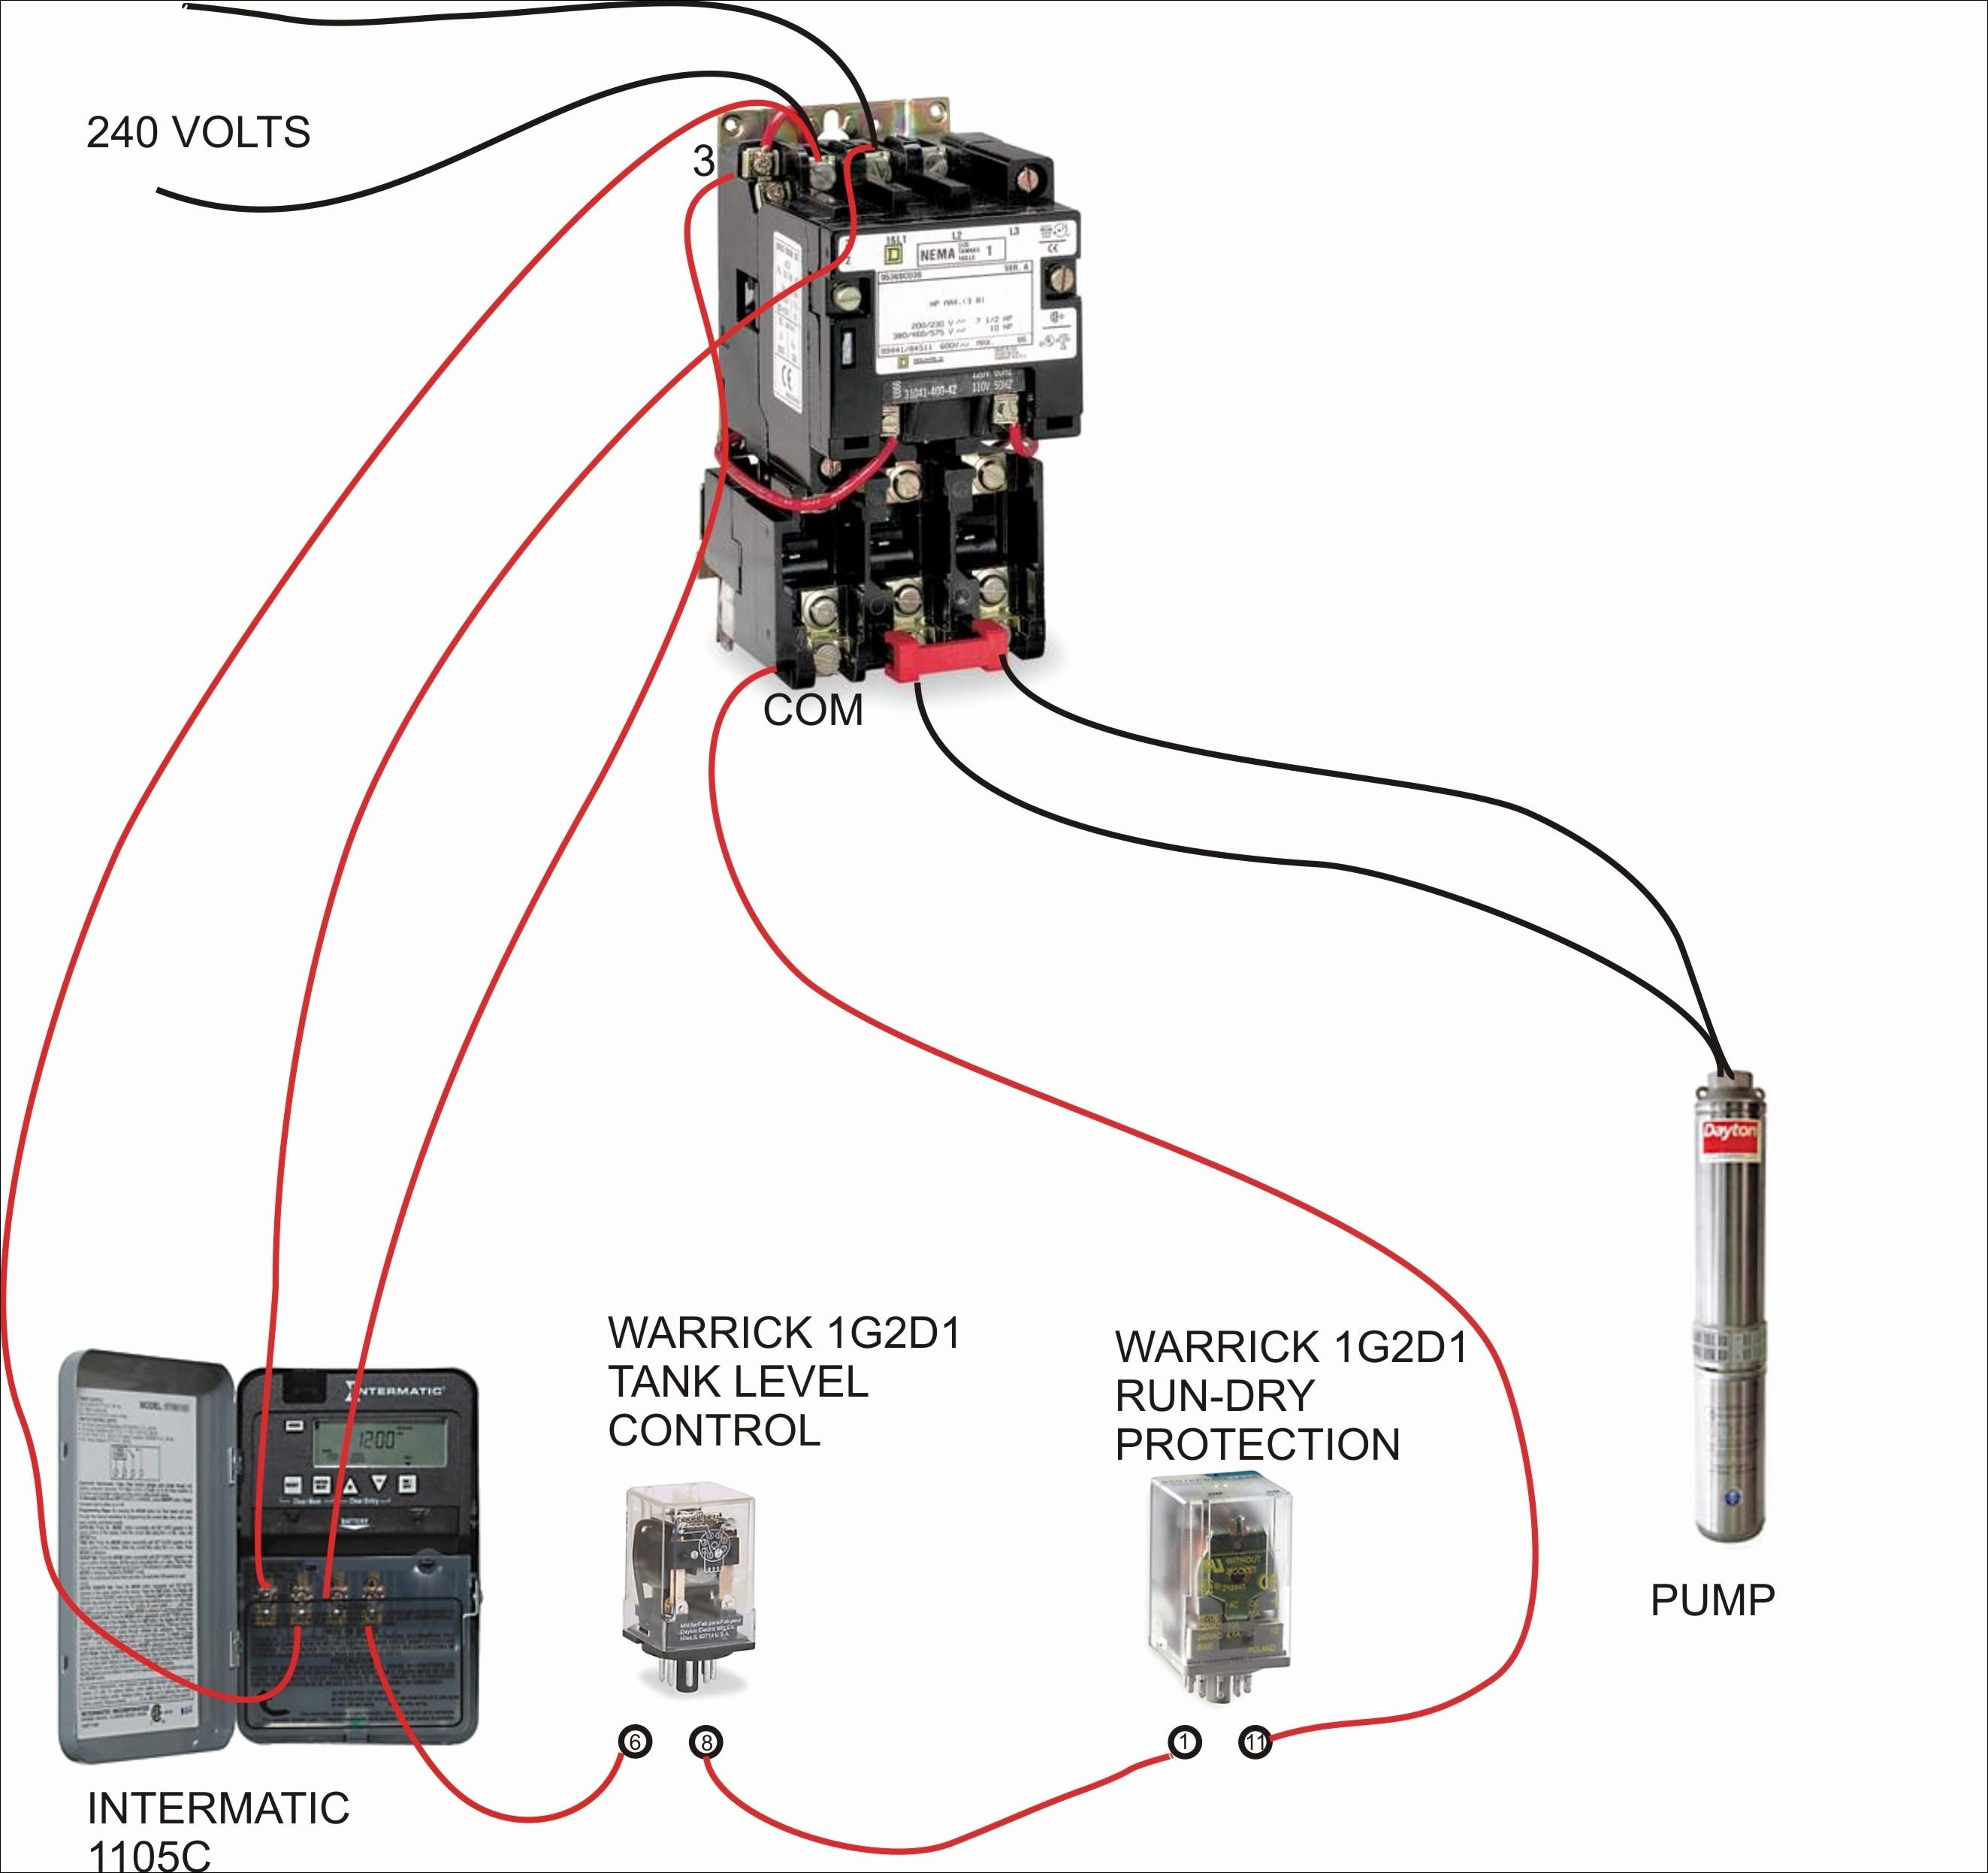 Square D Air Pressure Switch Wiring Diagram - No Pump Swamp Cooler Motor  Wiring Diagram - gravely.yenpancane.jeanjaures37.fr | Motor Contactor Wiring Diagram Pressure |  | Wiring Diagram Resource